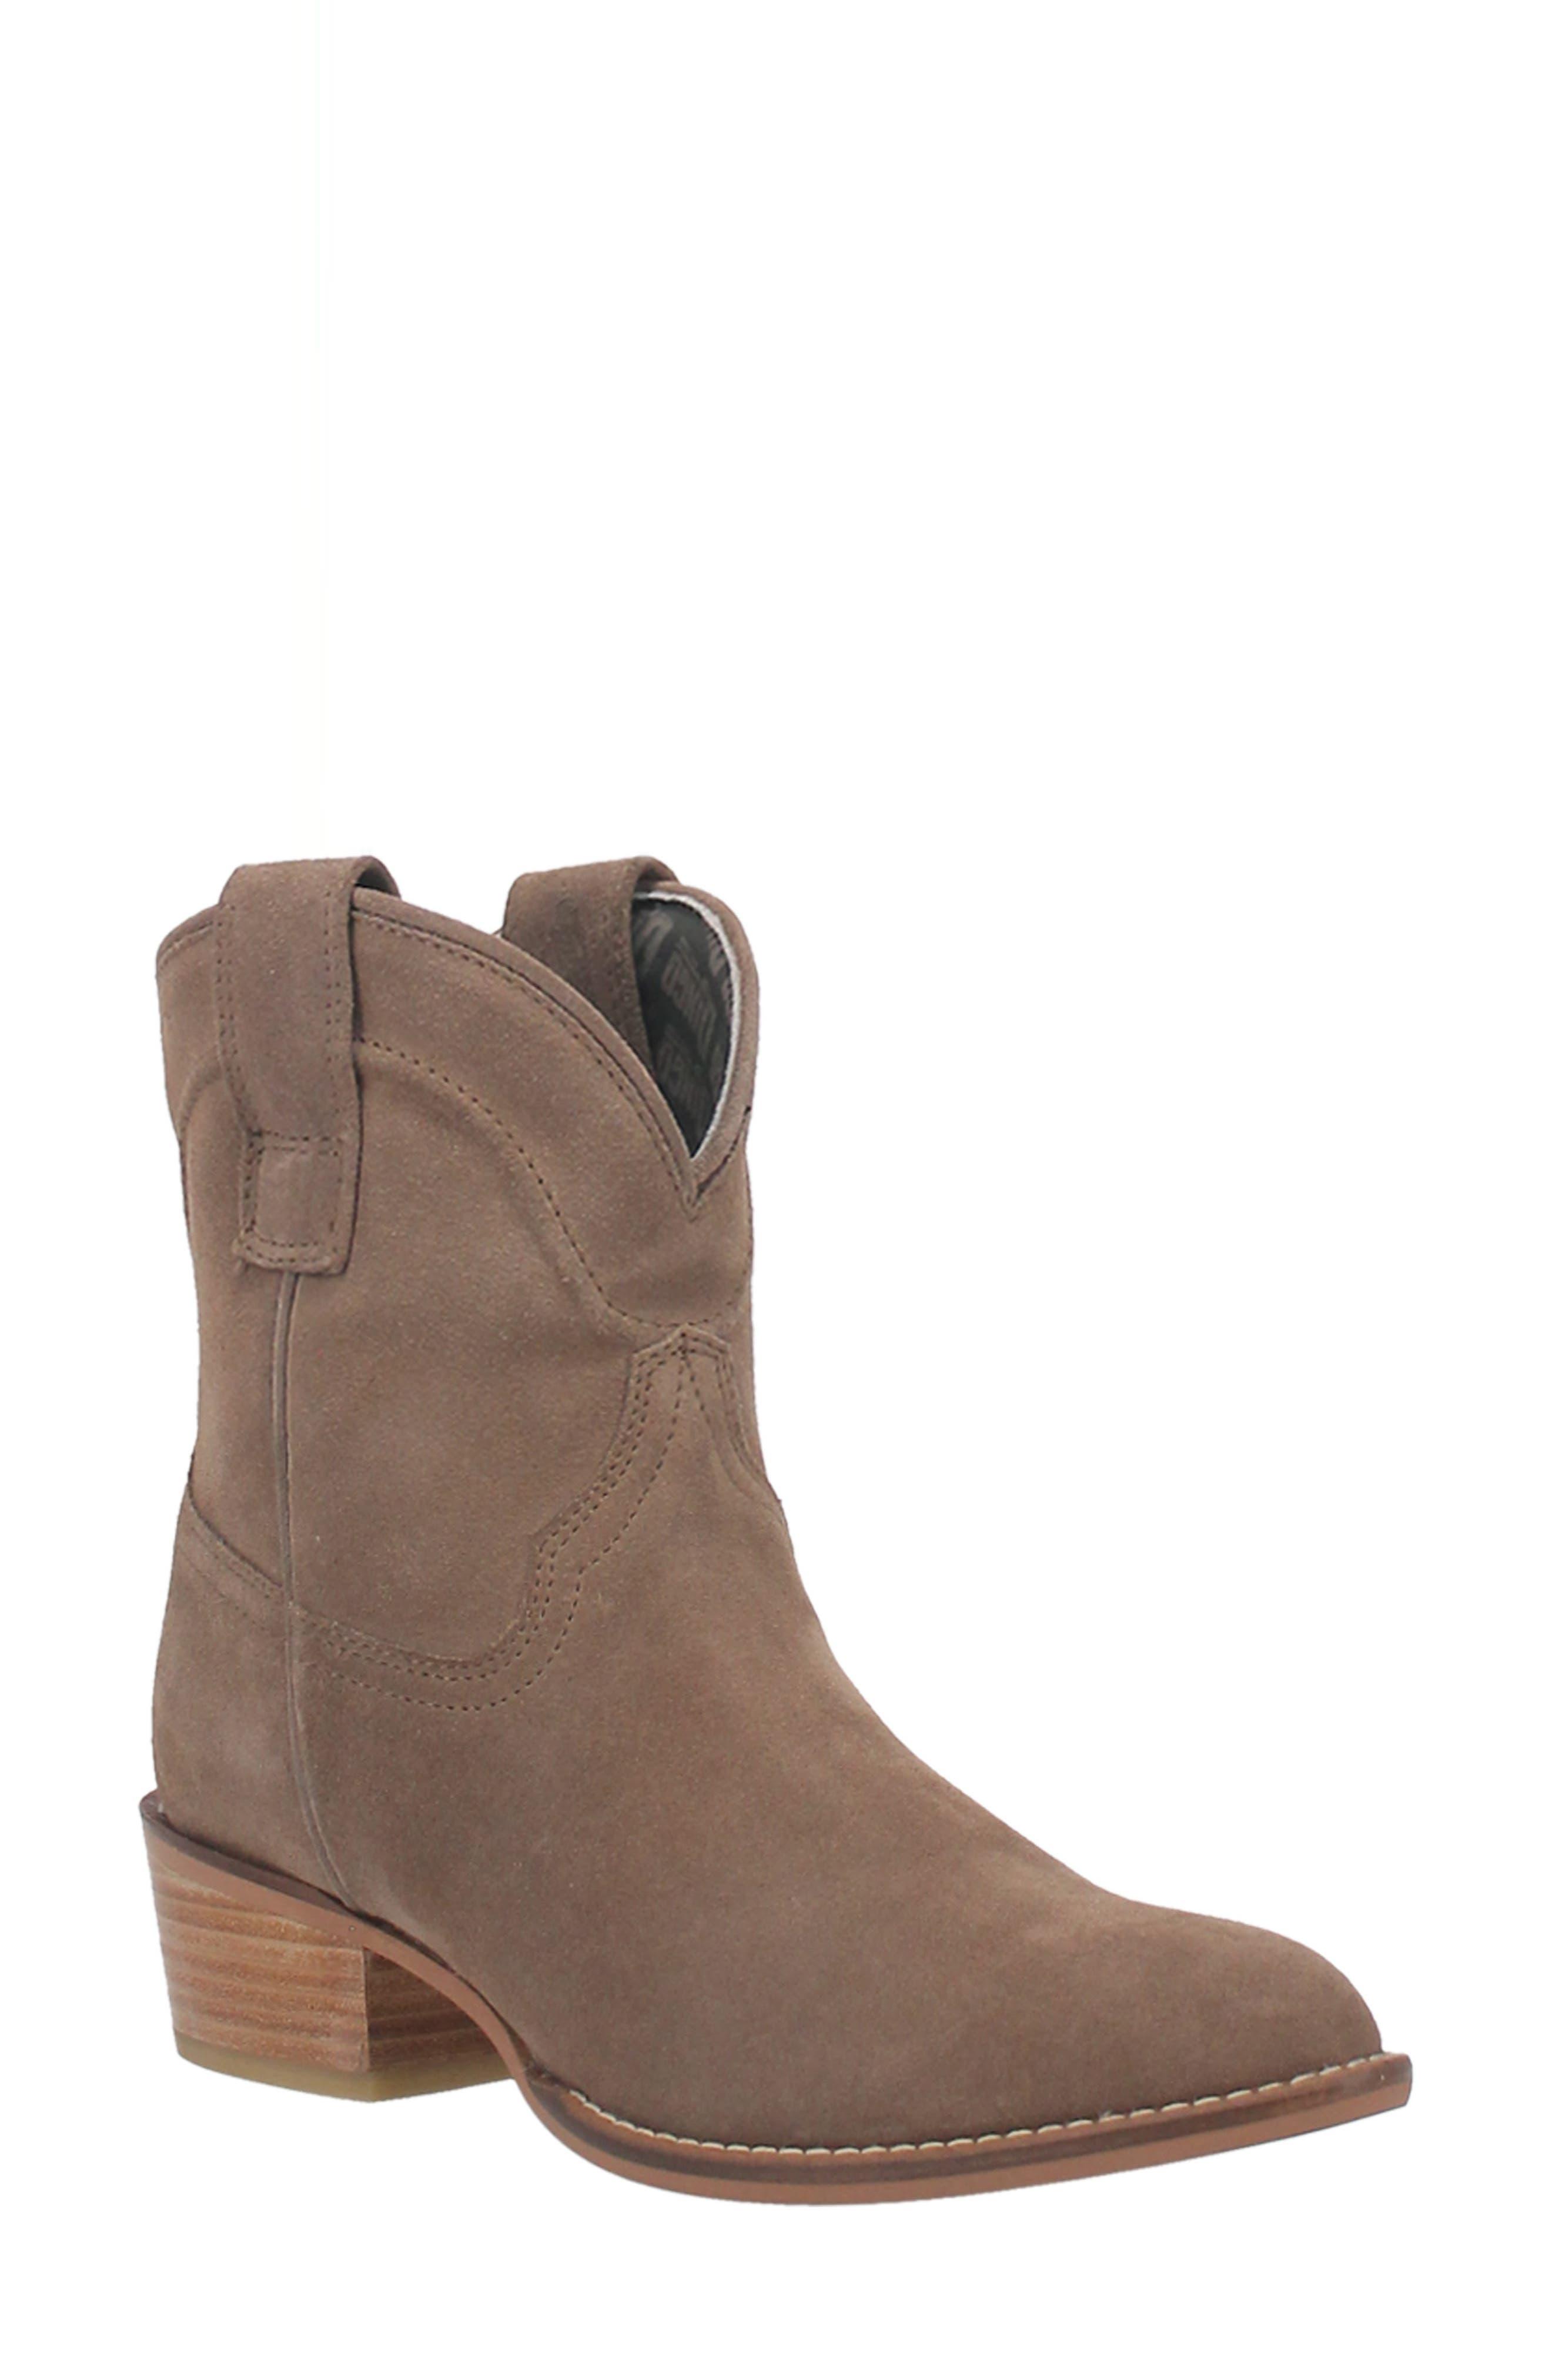 Tumbleweed Western Boot